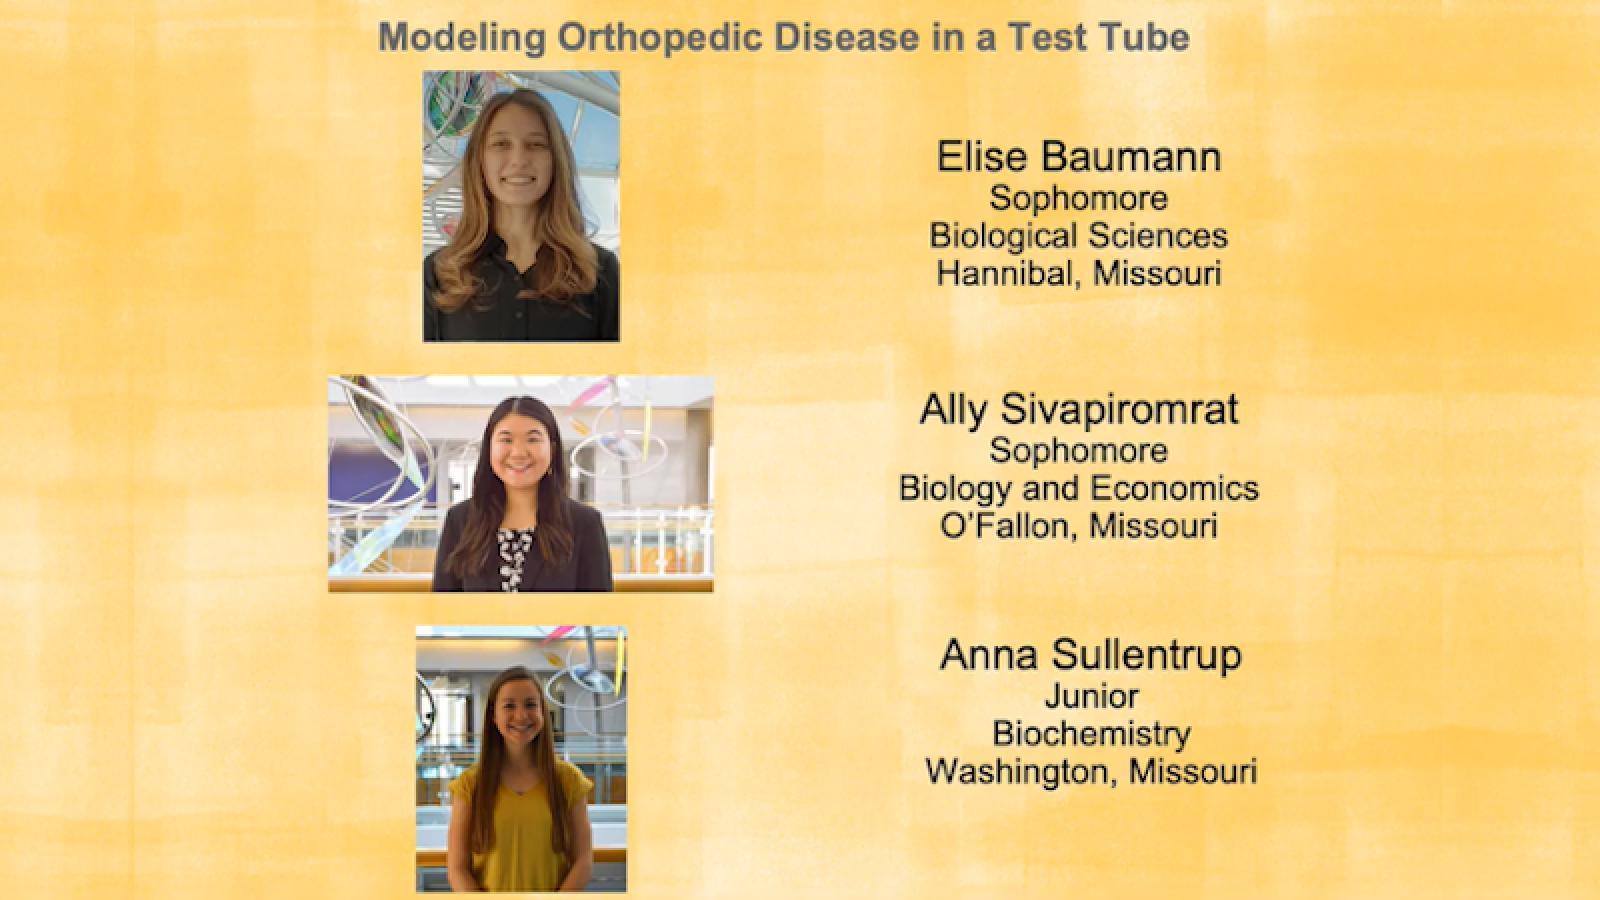 TLRO undergraduates Elise Baumann, Ally Sivapiromat, and Anna Sullentrup